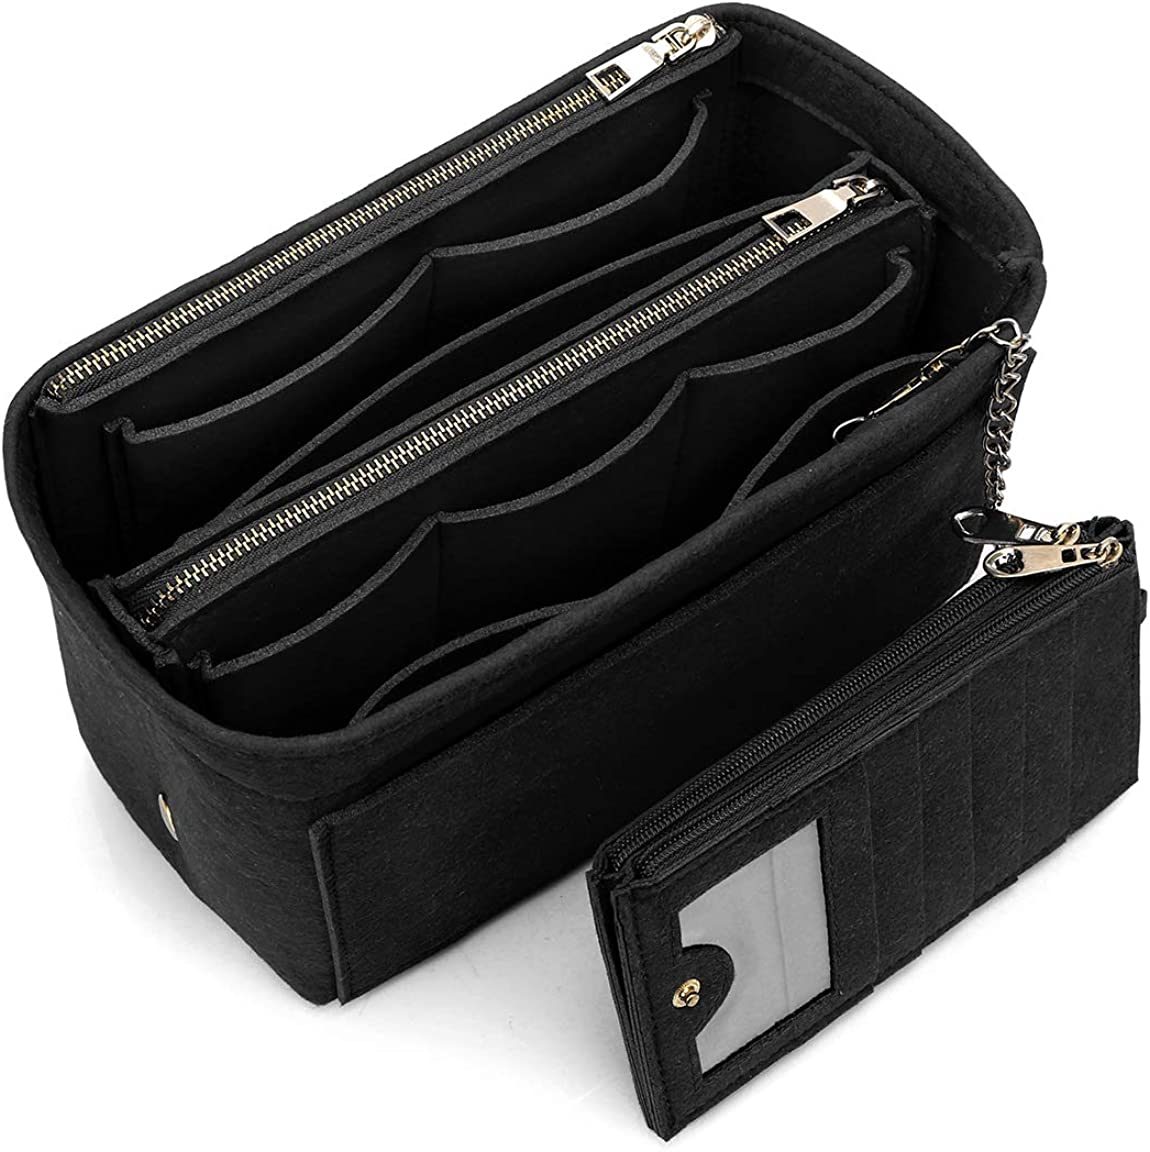 VANCORE バッグインバッグ 軽量 自立 Bag in Bag フェルト チャック付き 小さめ 大きめ バッグの中 整理 整頓 通勤 旅行 ブラック